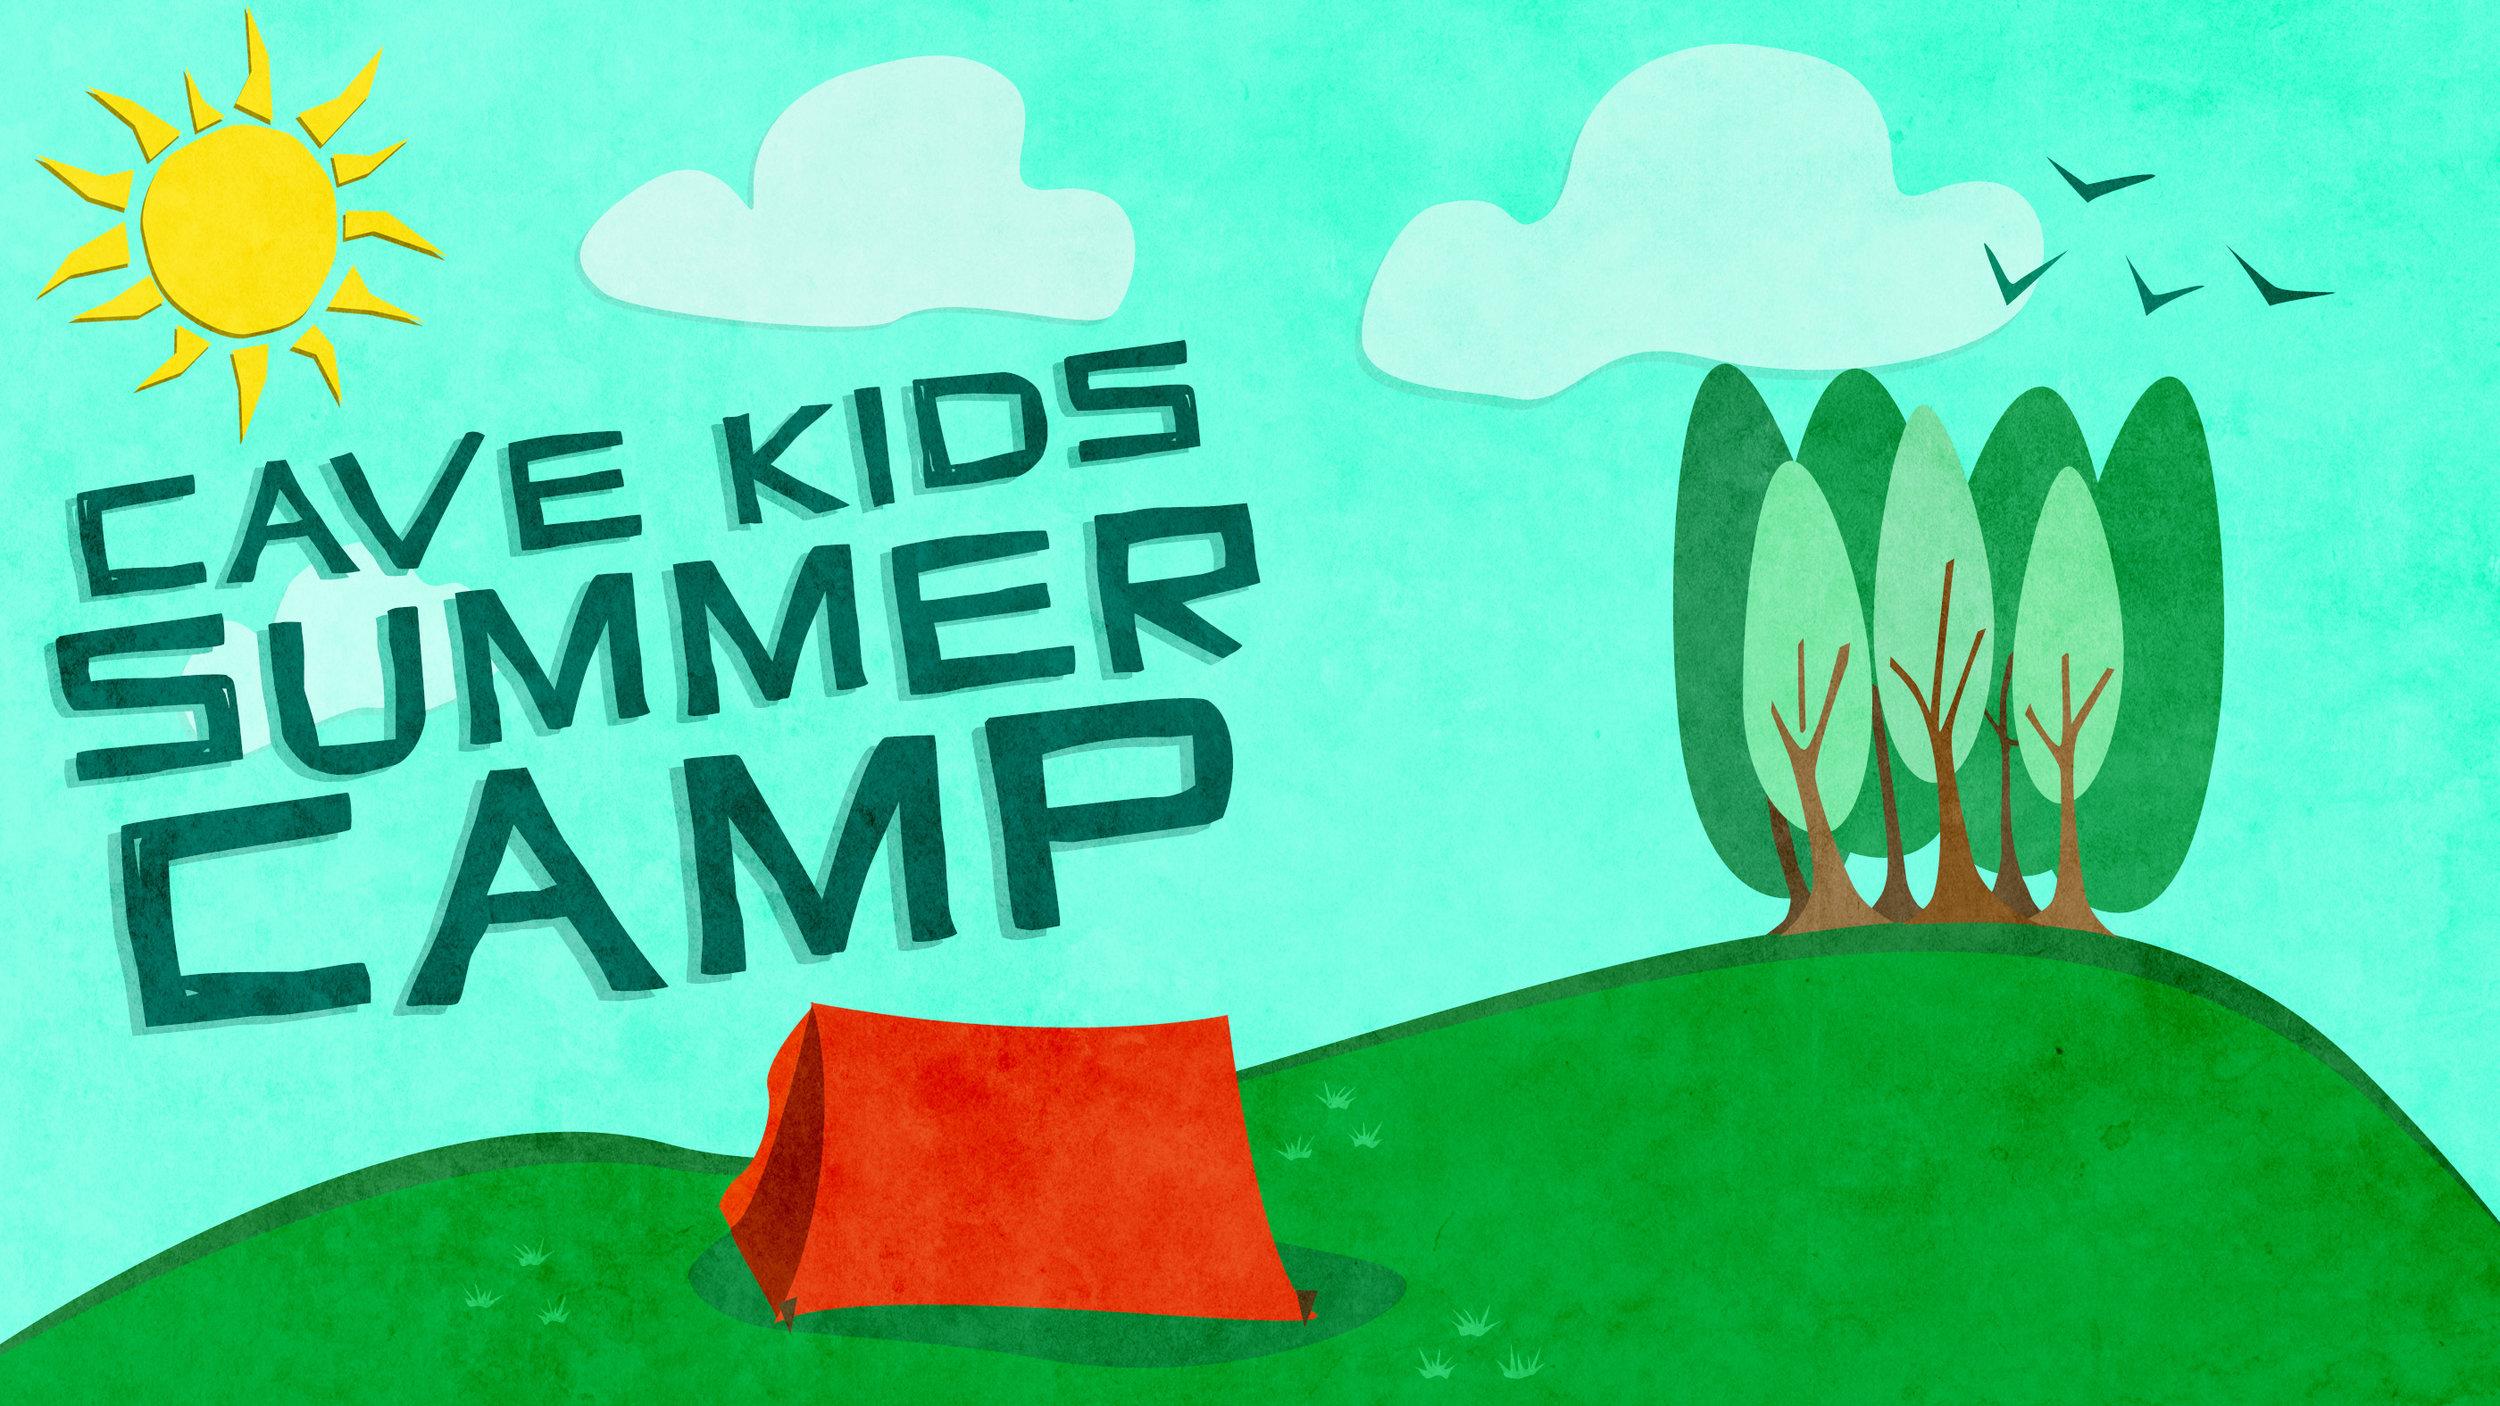 Cave_Kids_Summer_Camp.jpg